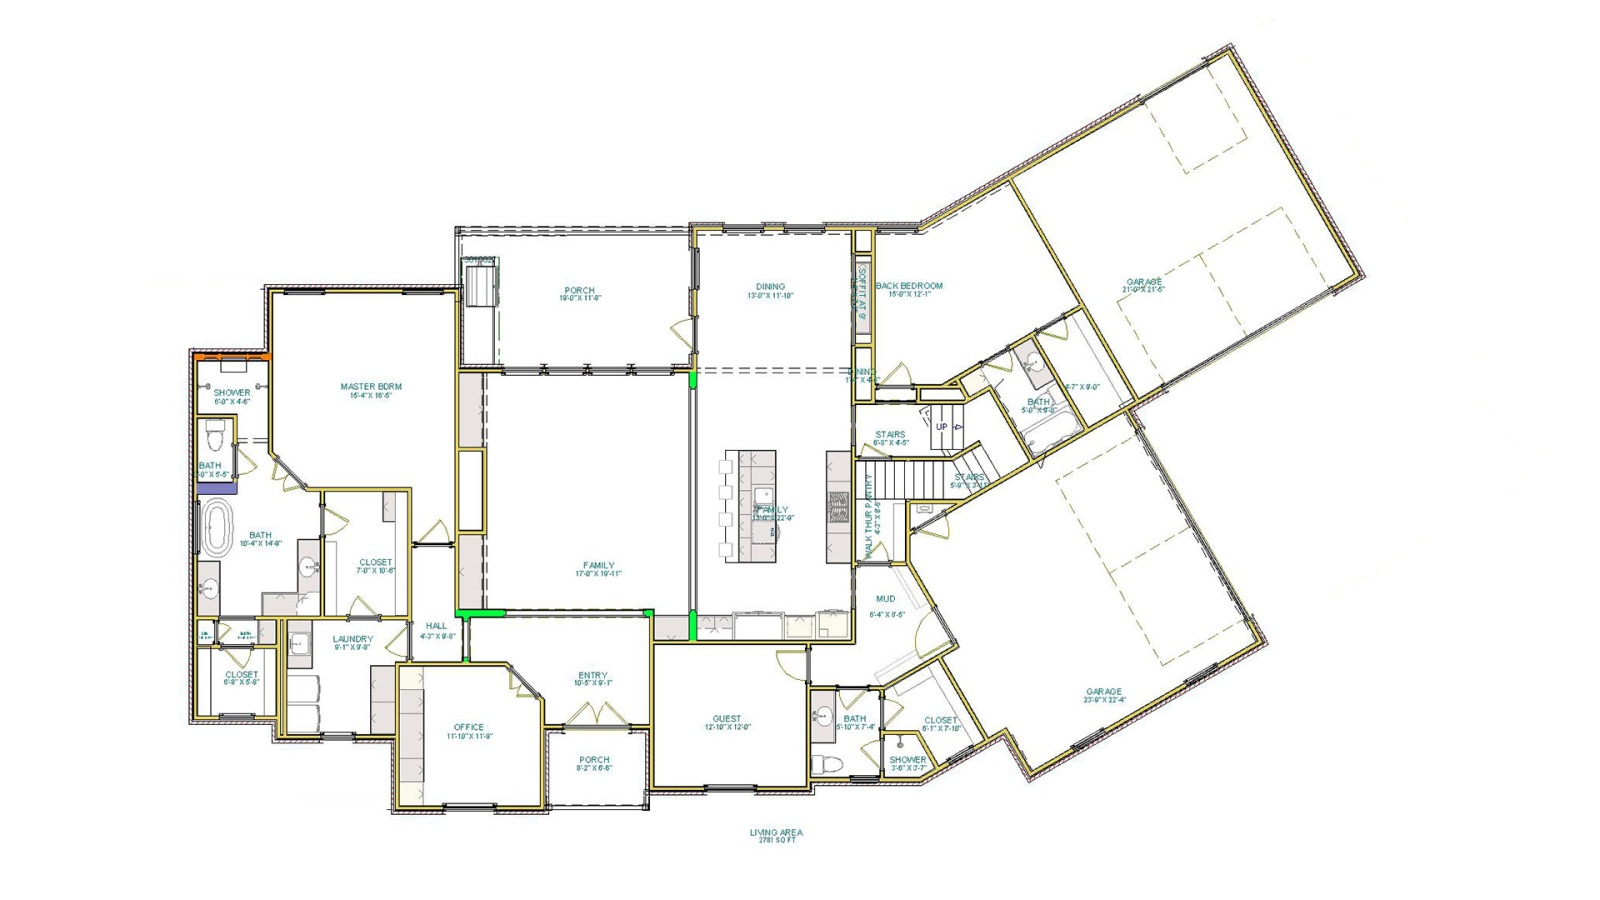 5 Bedrooms Bedrooms, ,4 BathroomsBathrooms,Custom Home,Home Plans,1061